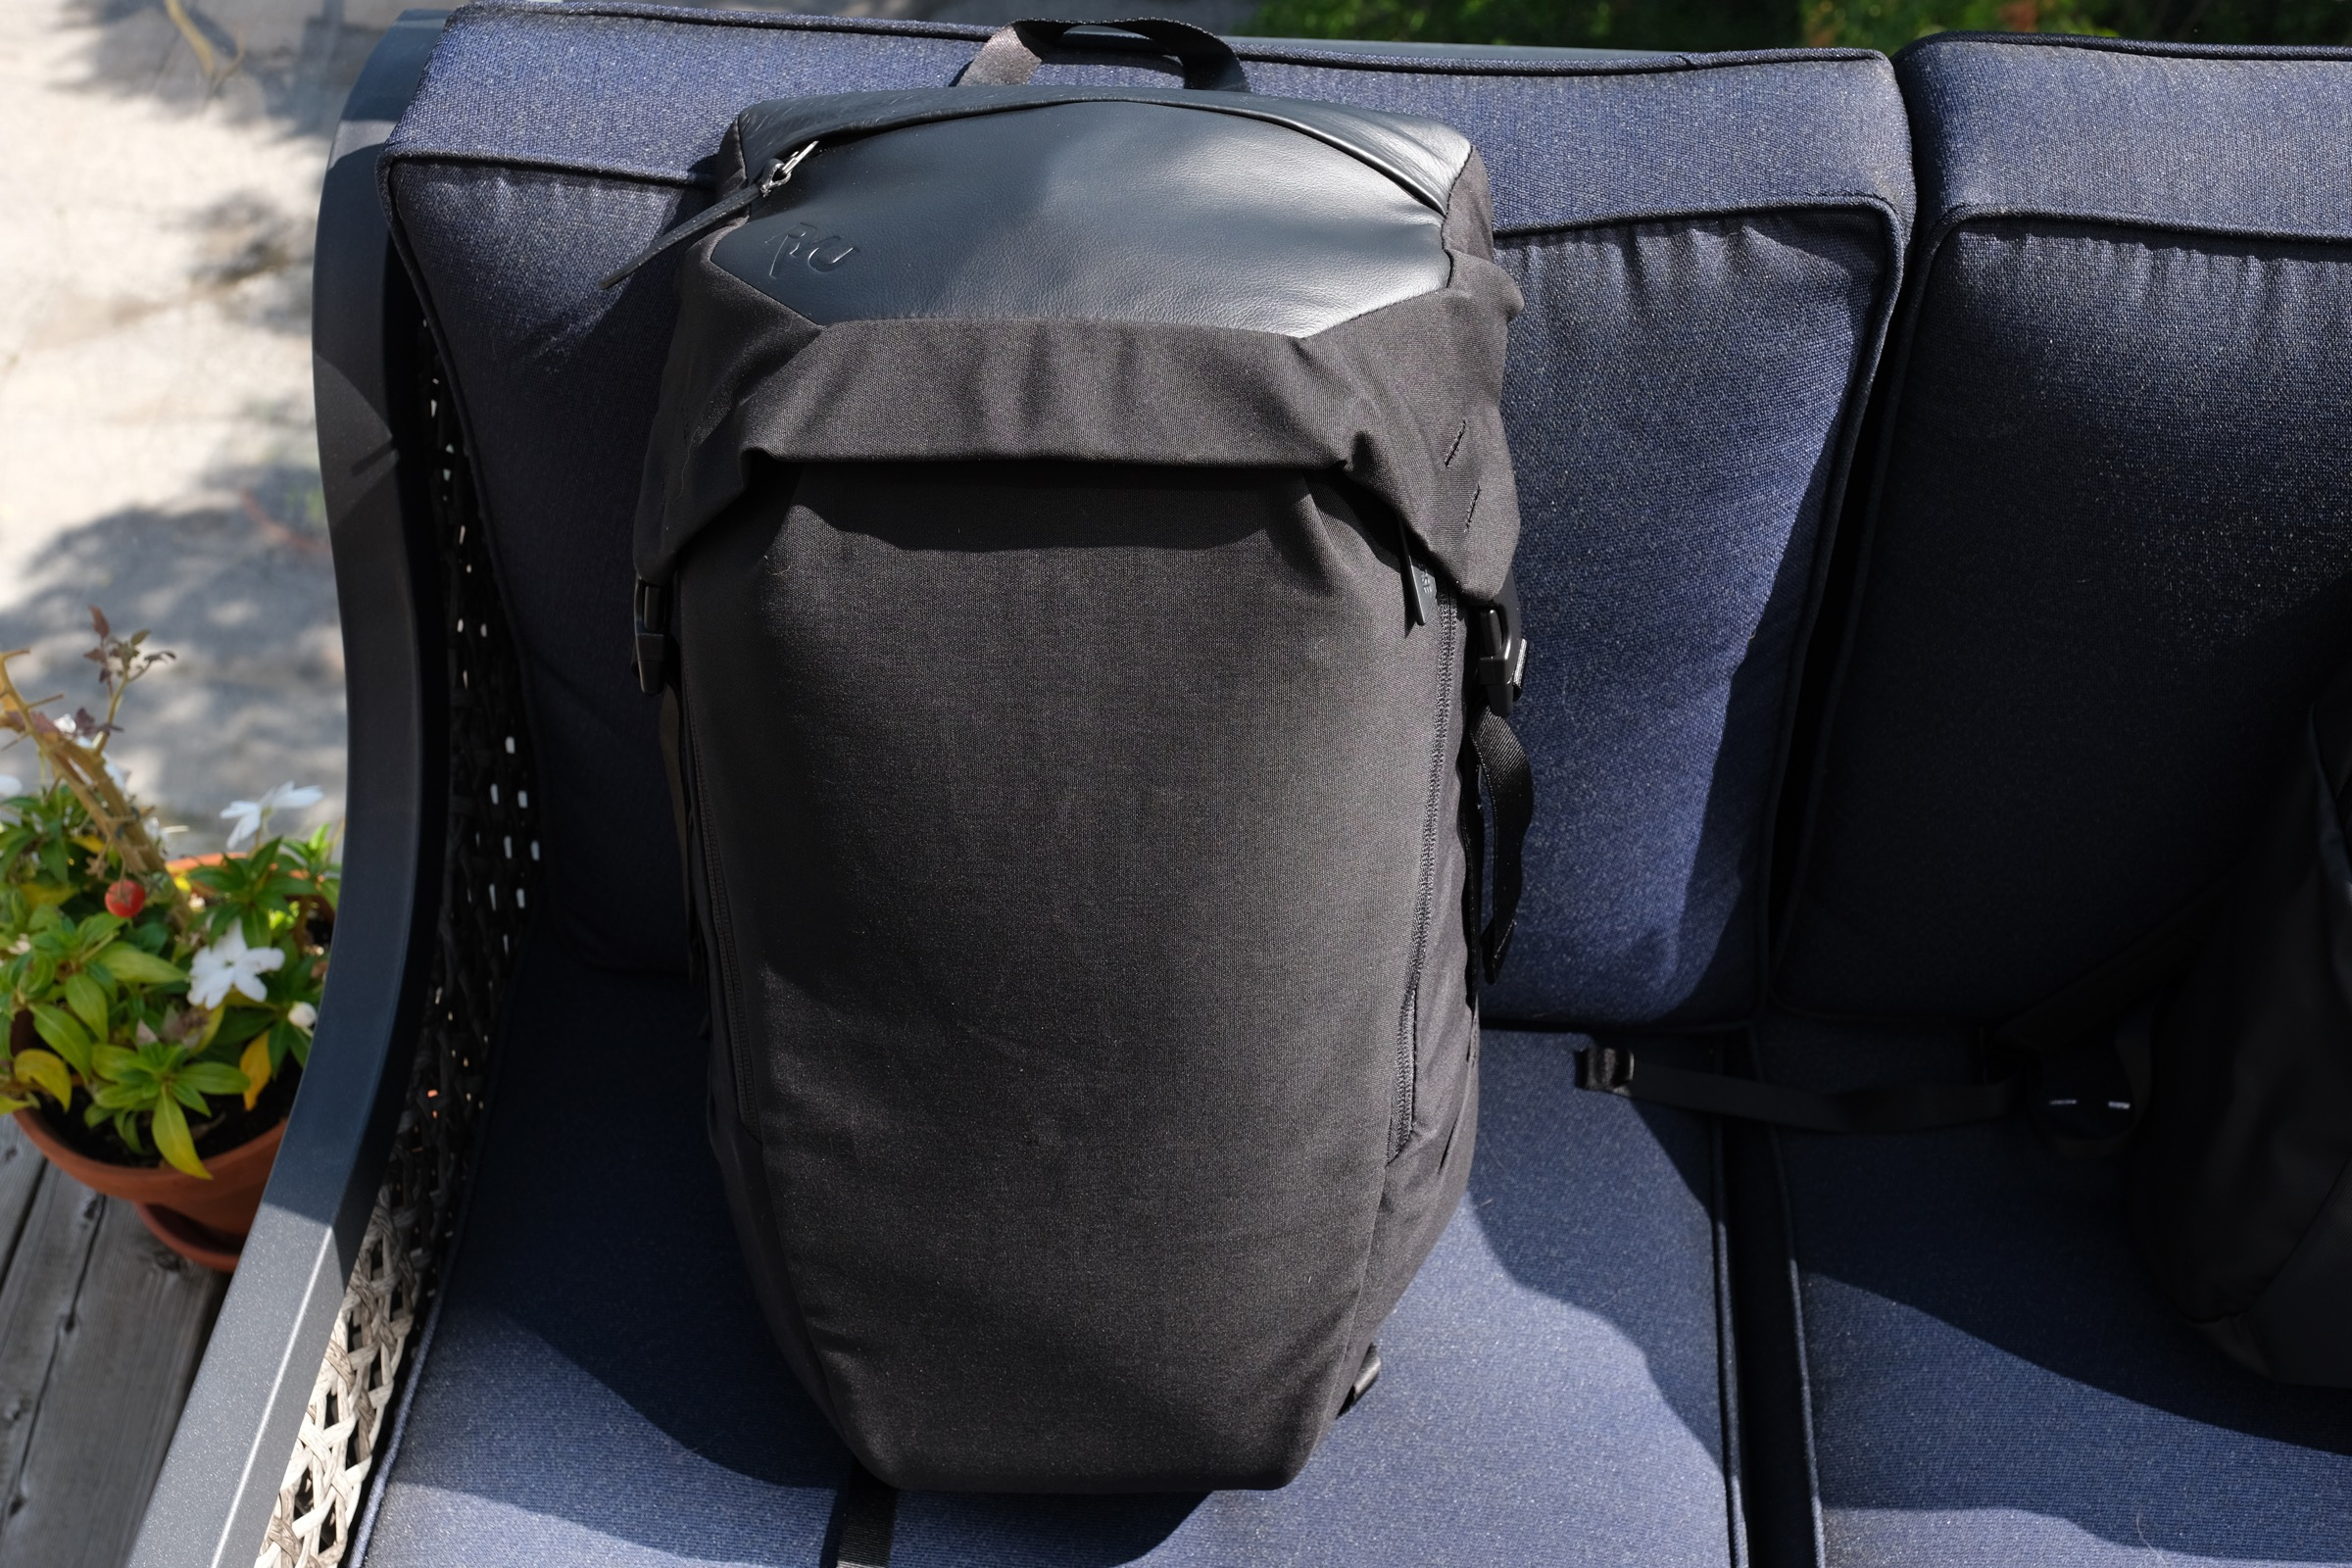 RYU bags 3 Locker Pack 18L